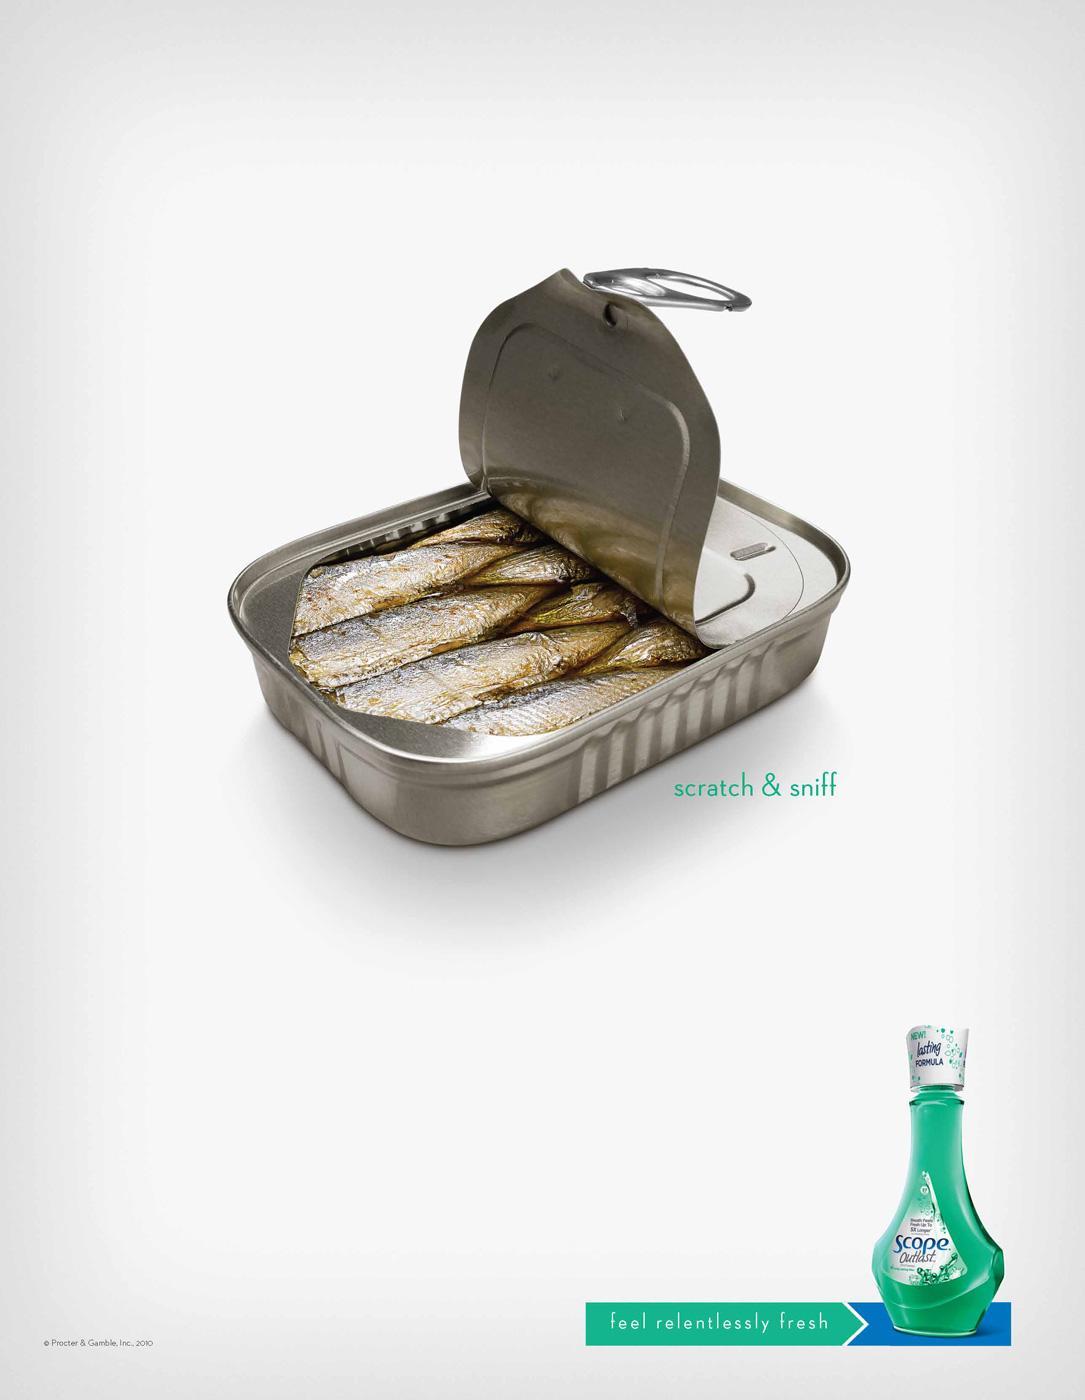 Scope Print Ad -  Relentlessly Fresh Sardines